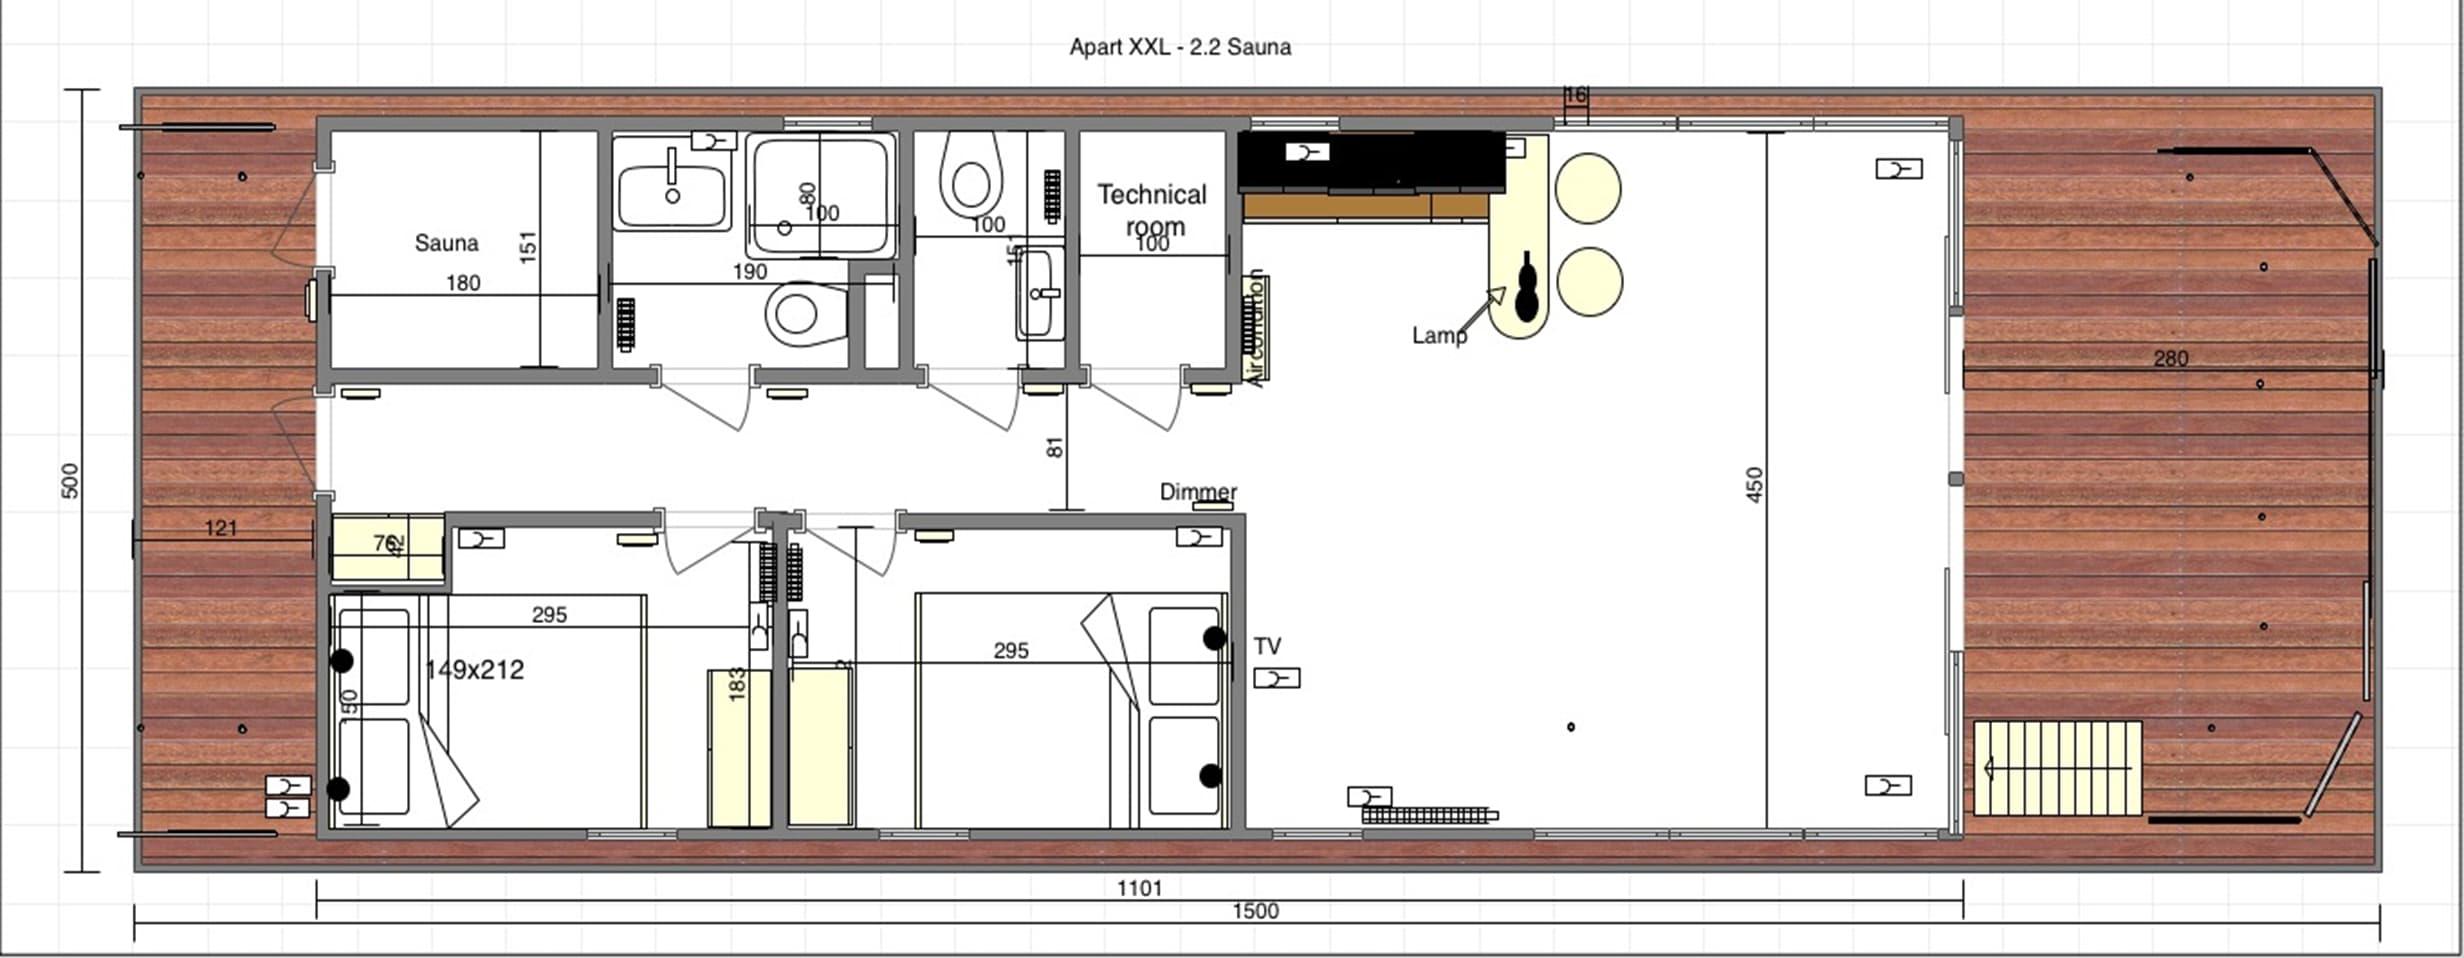 layout water apartment sauna